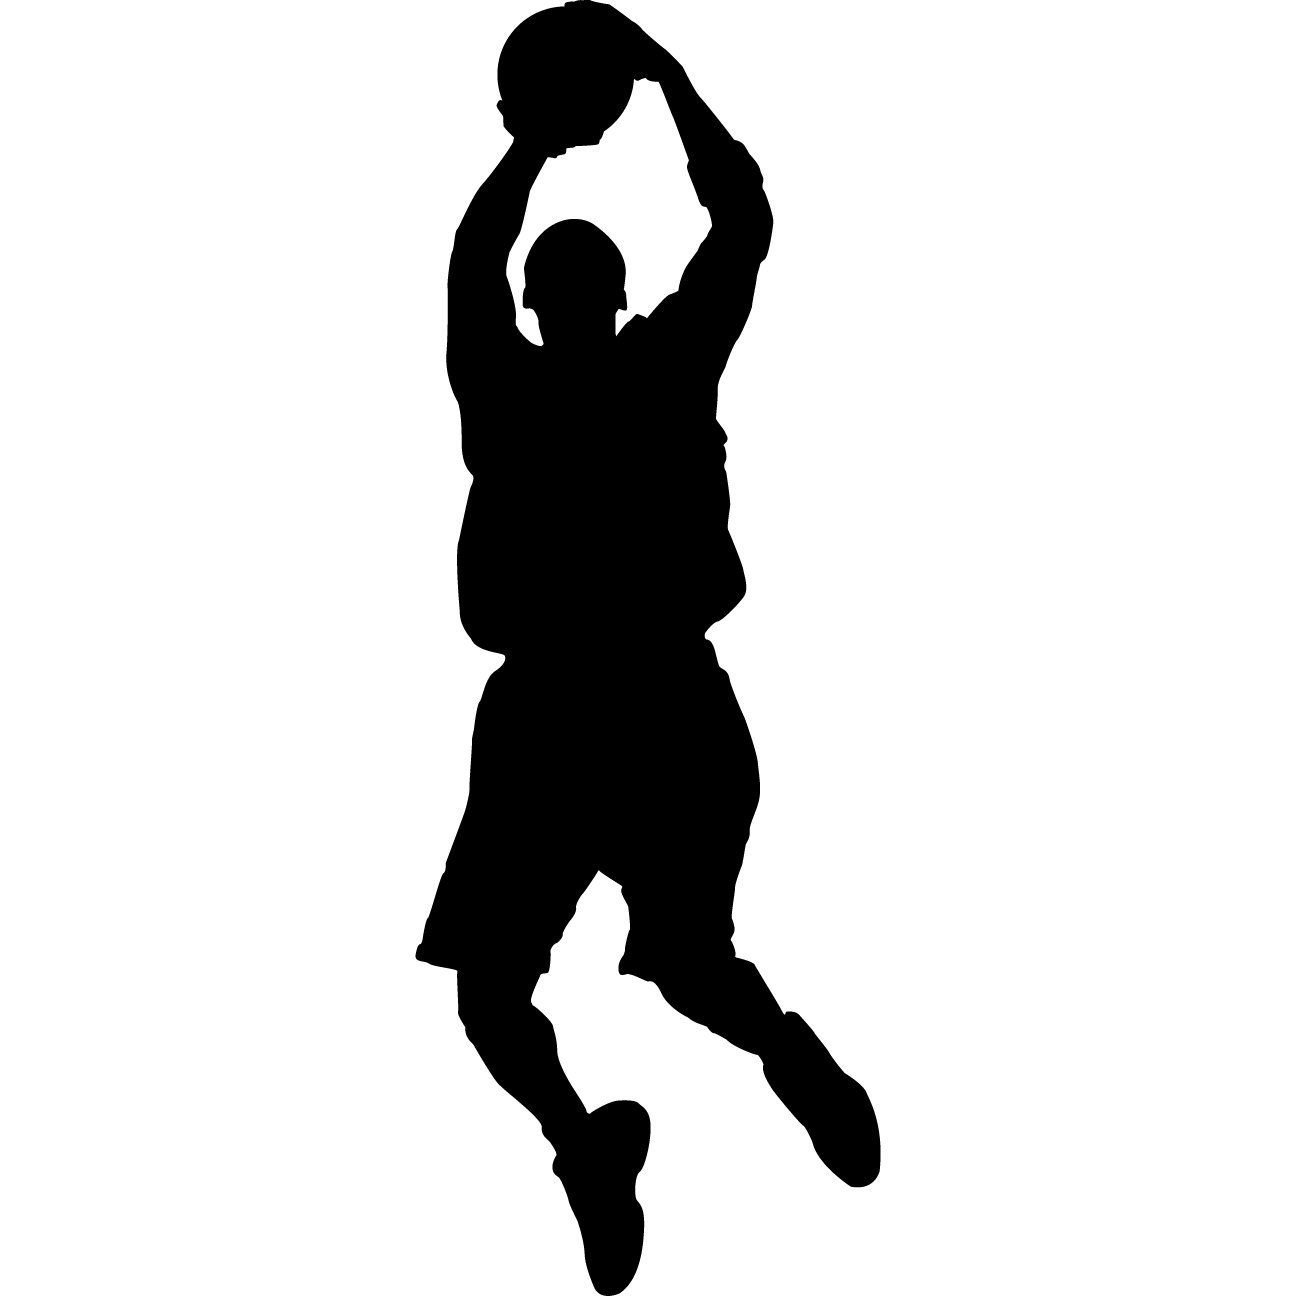 1296x1296 Basketball Silhouette Clipart